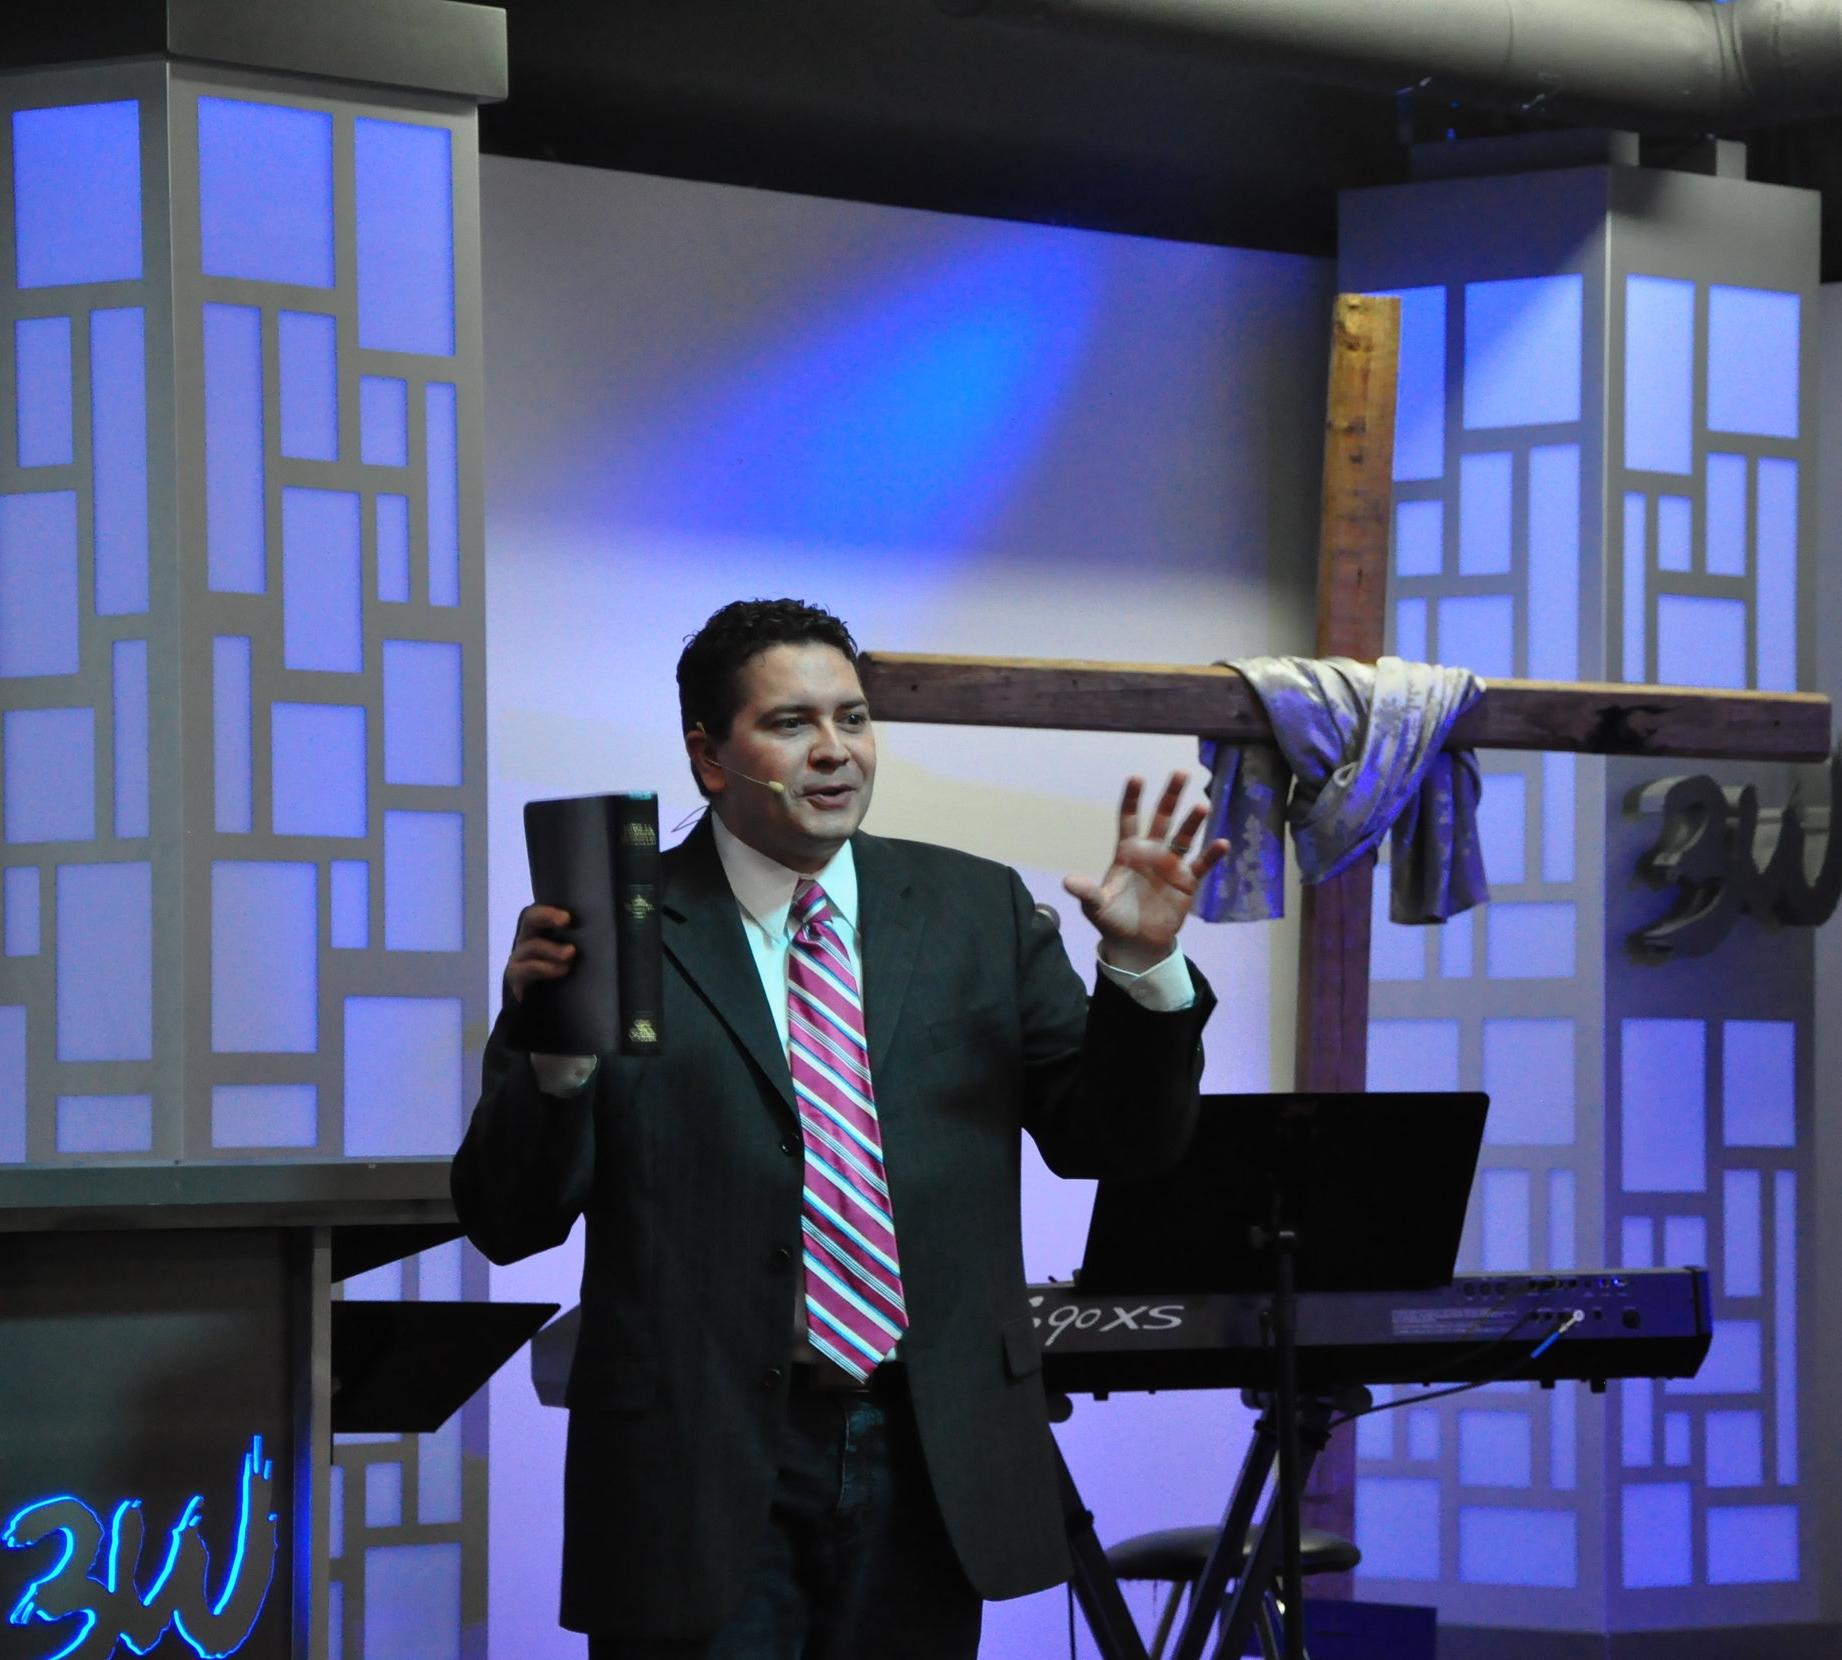 Pastor David Perez